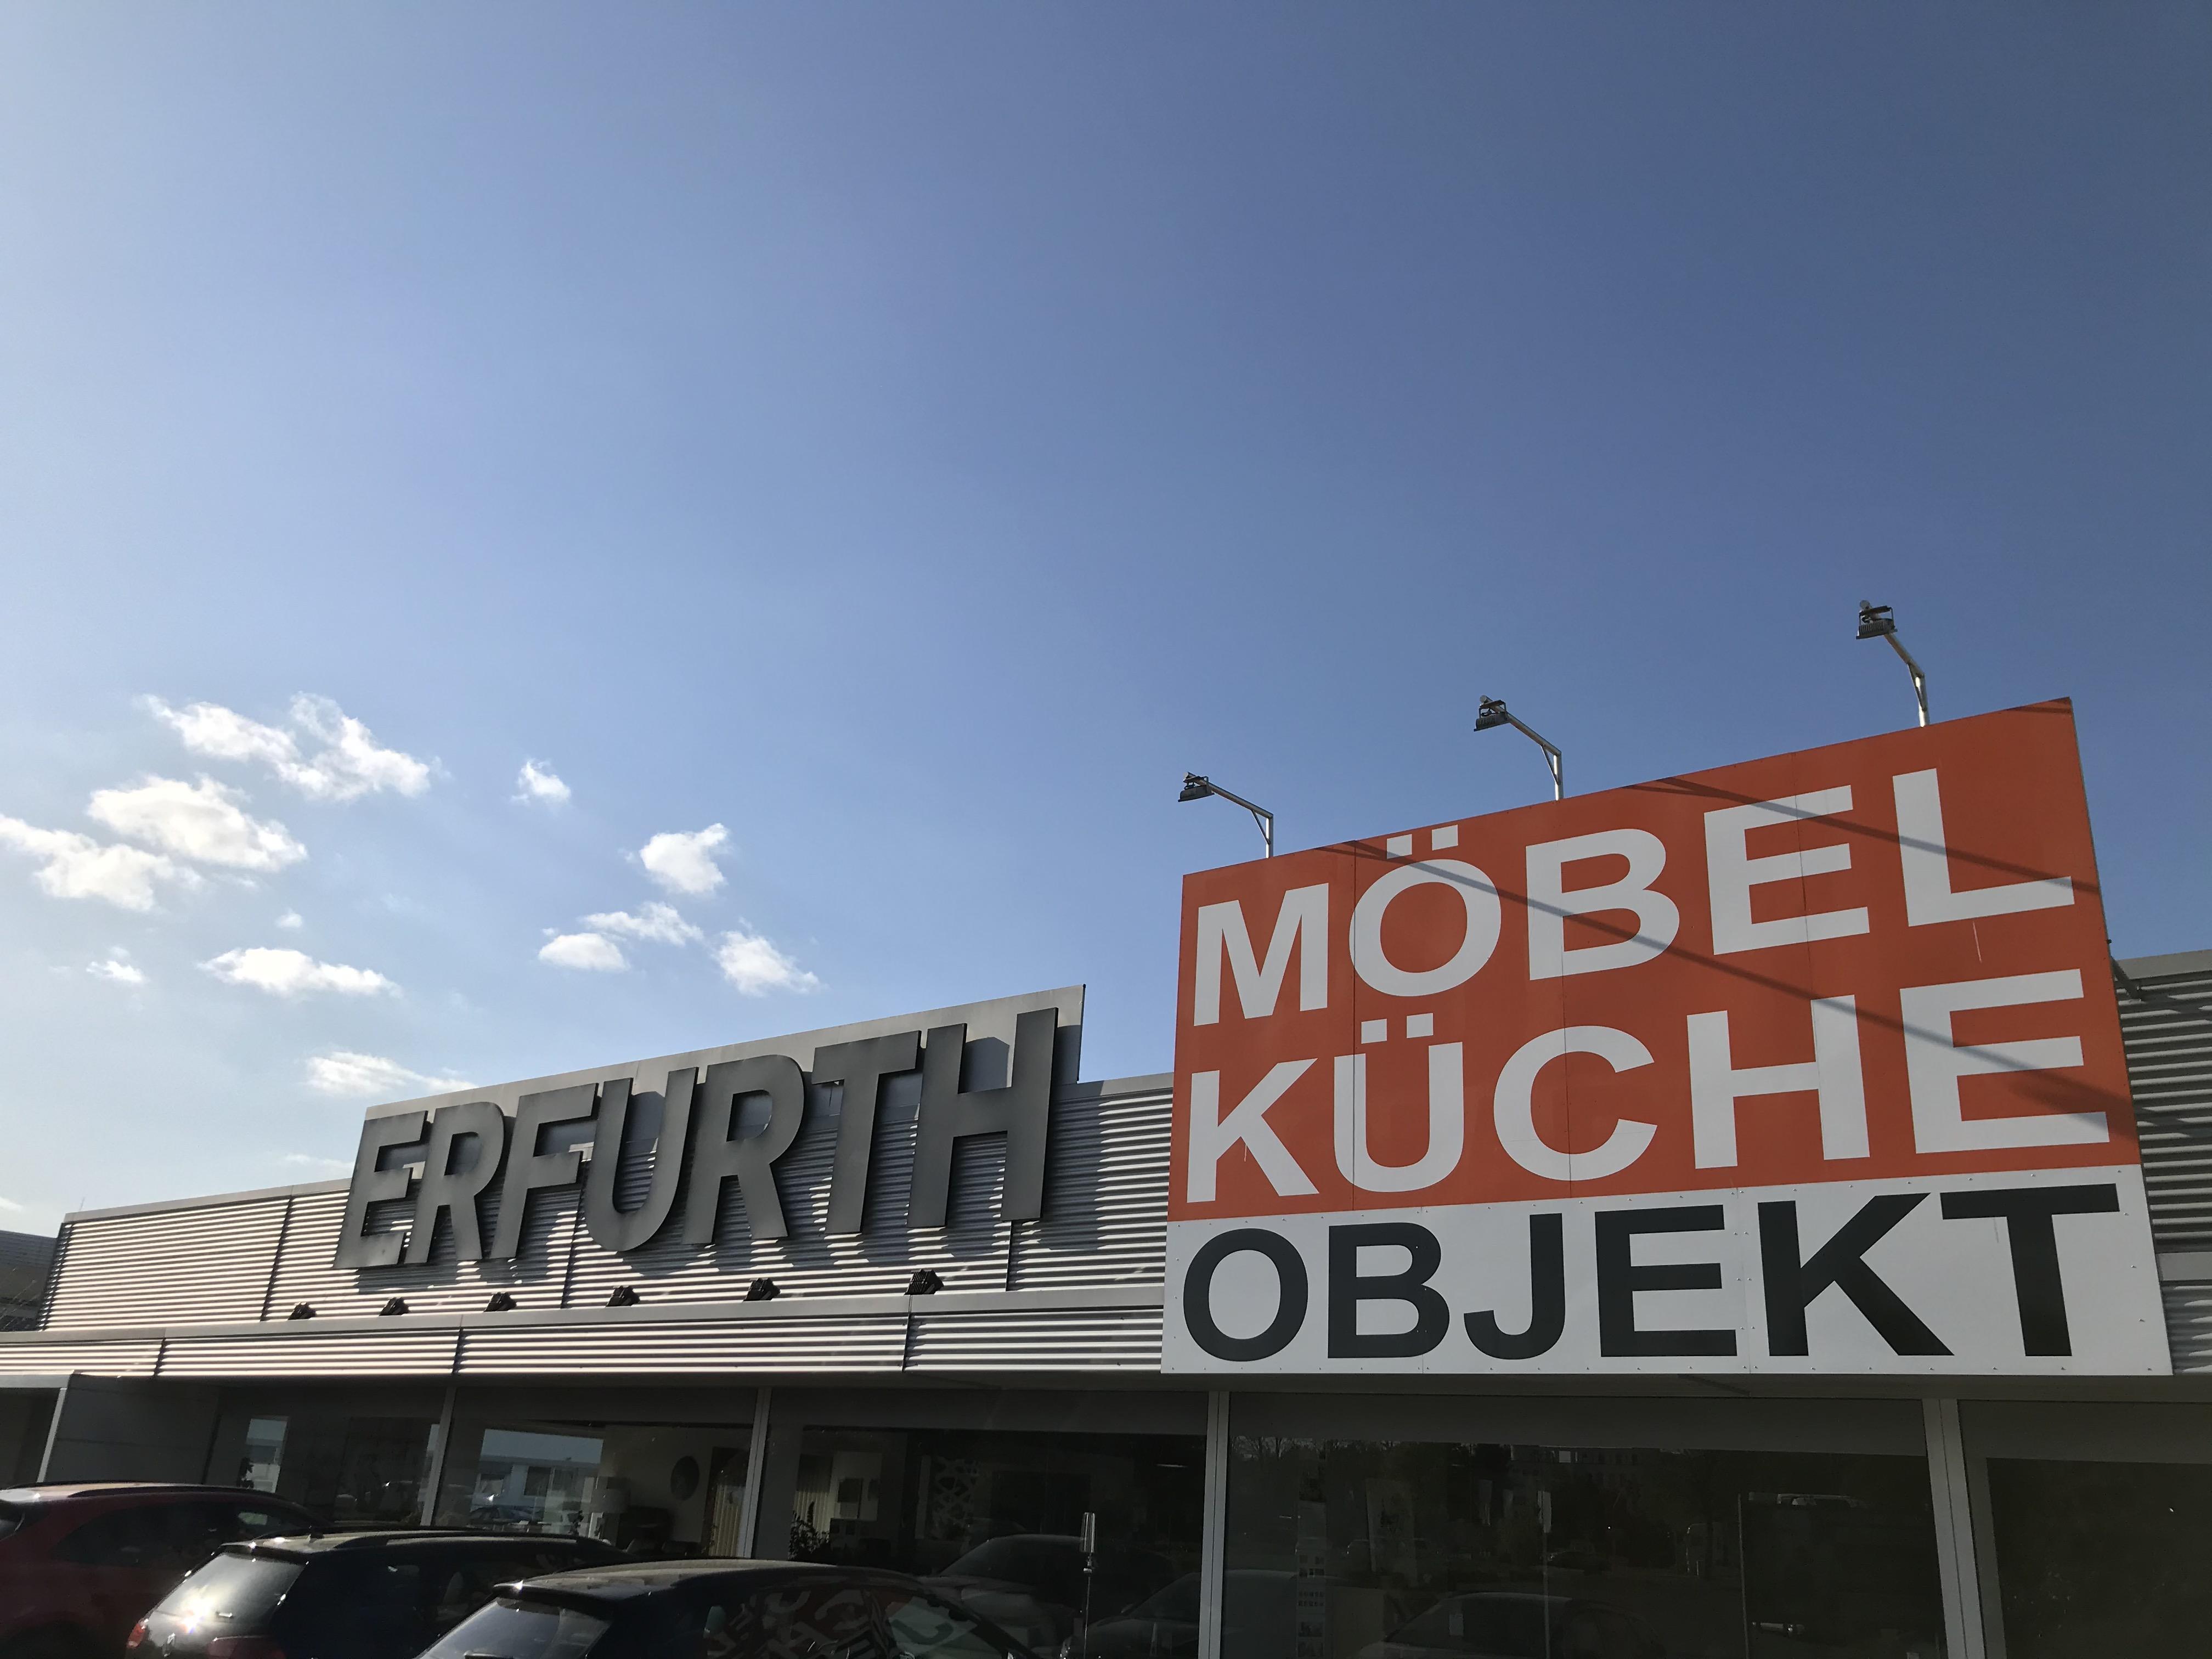 moebel-erfurth-gmbh-nieder-olm banner